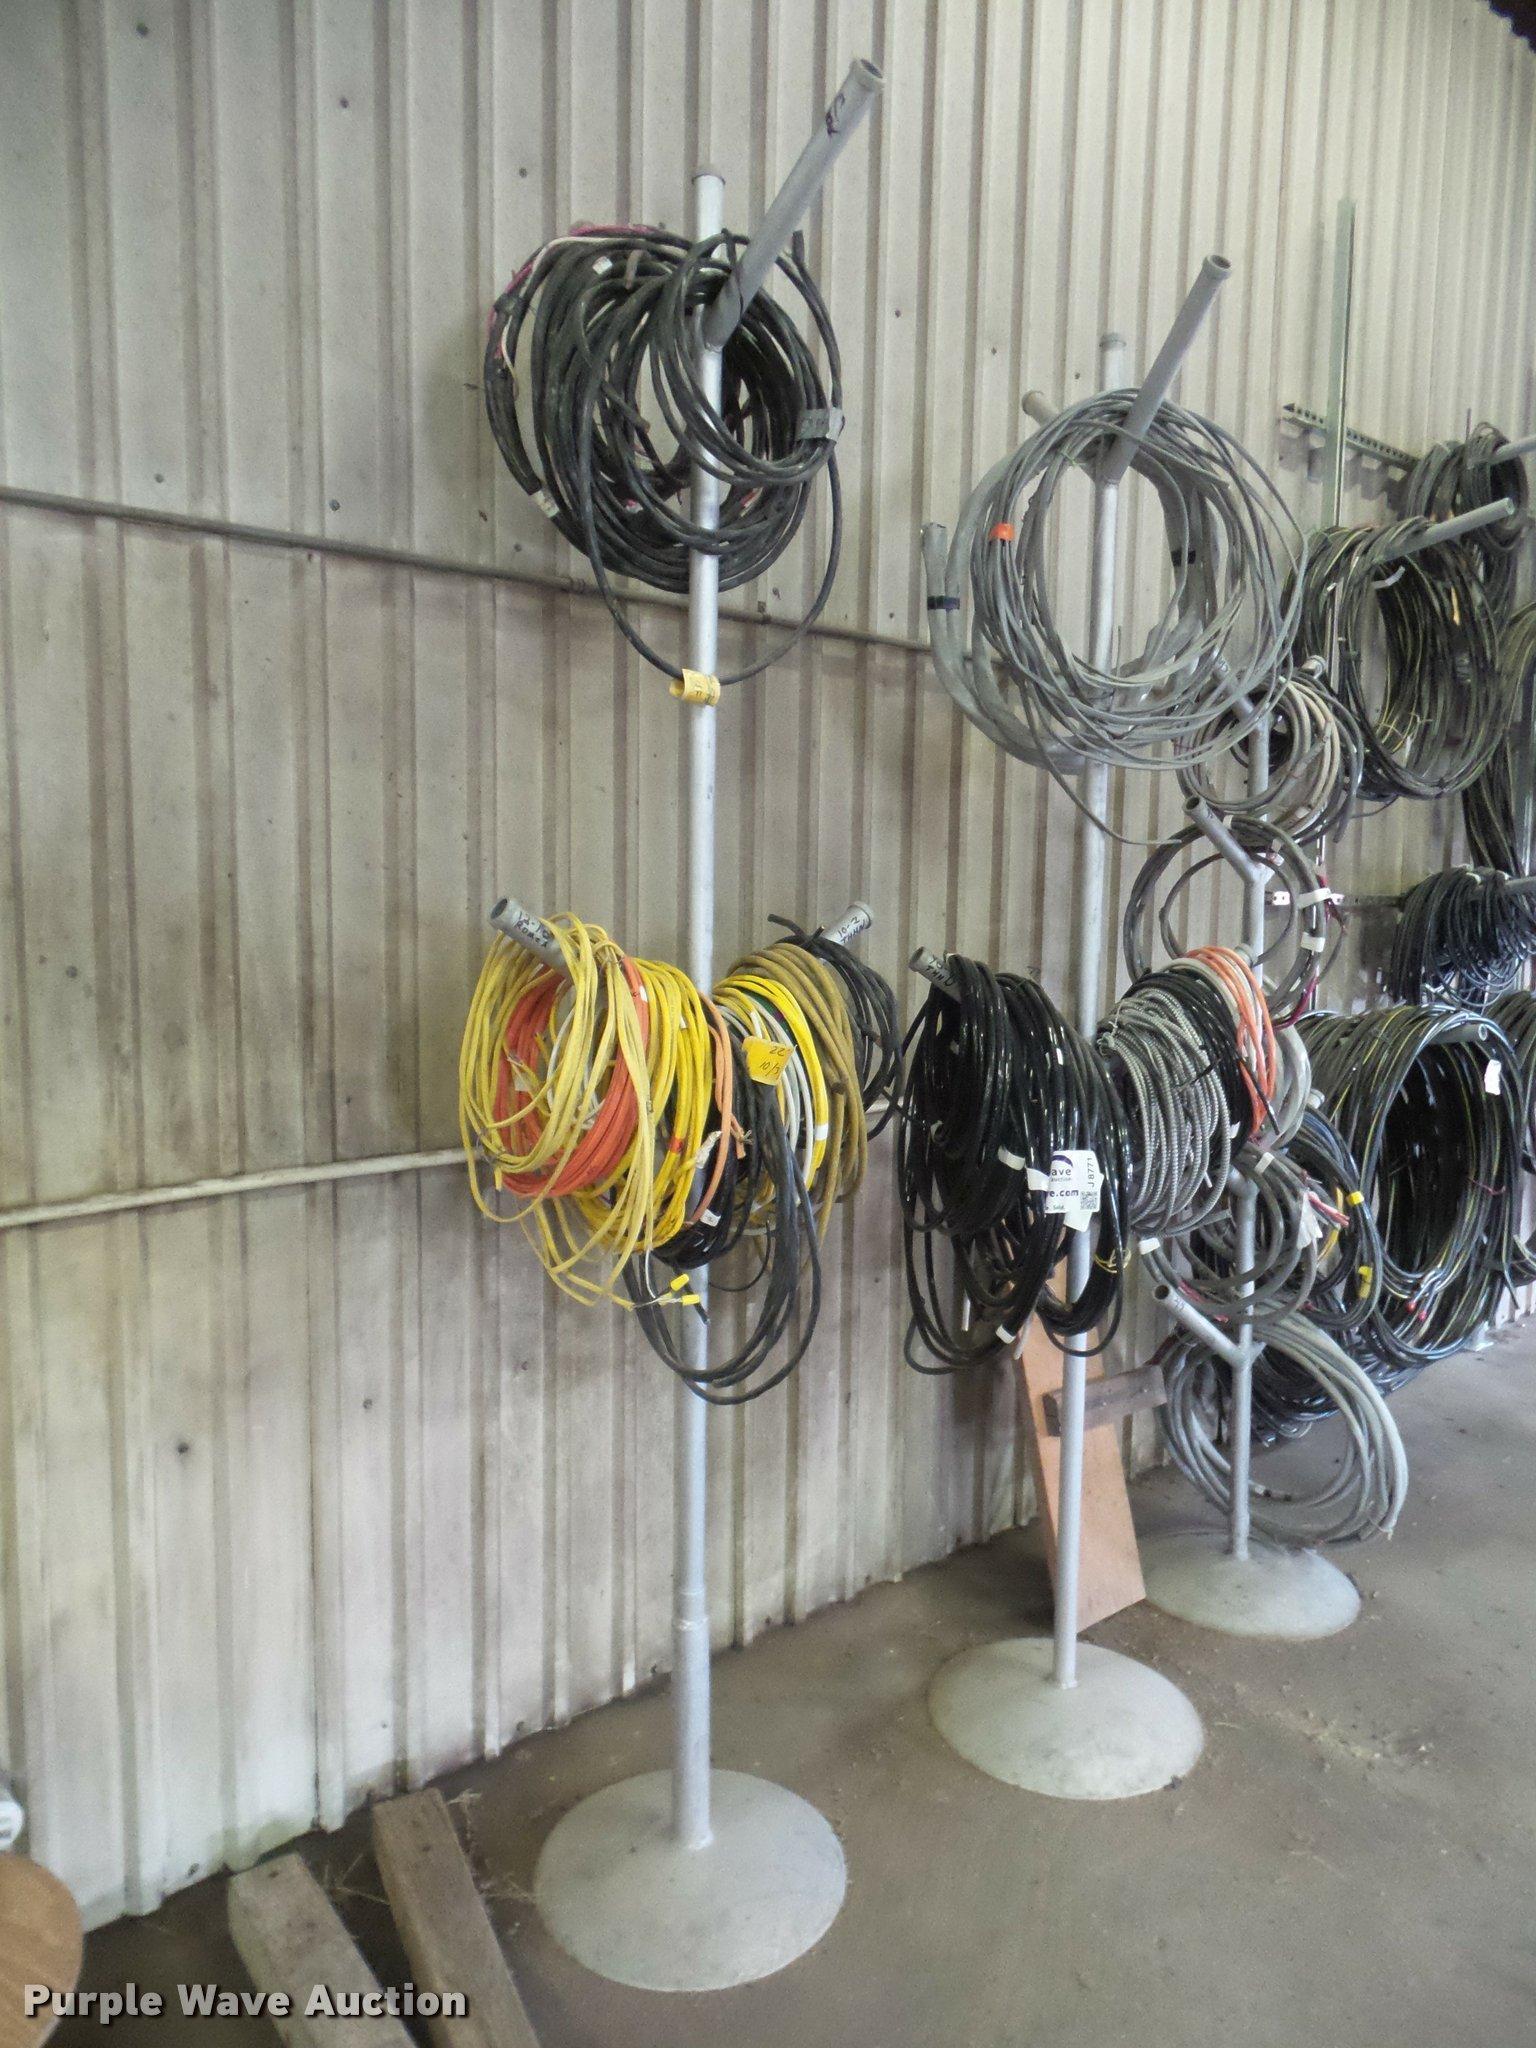 Flex Romex wire | Item J8771 | SOLD! March 1 Vehicles and Eq...